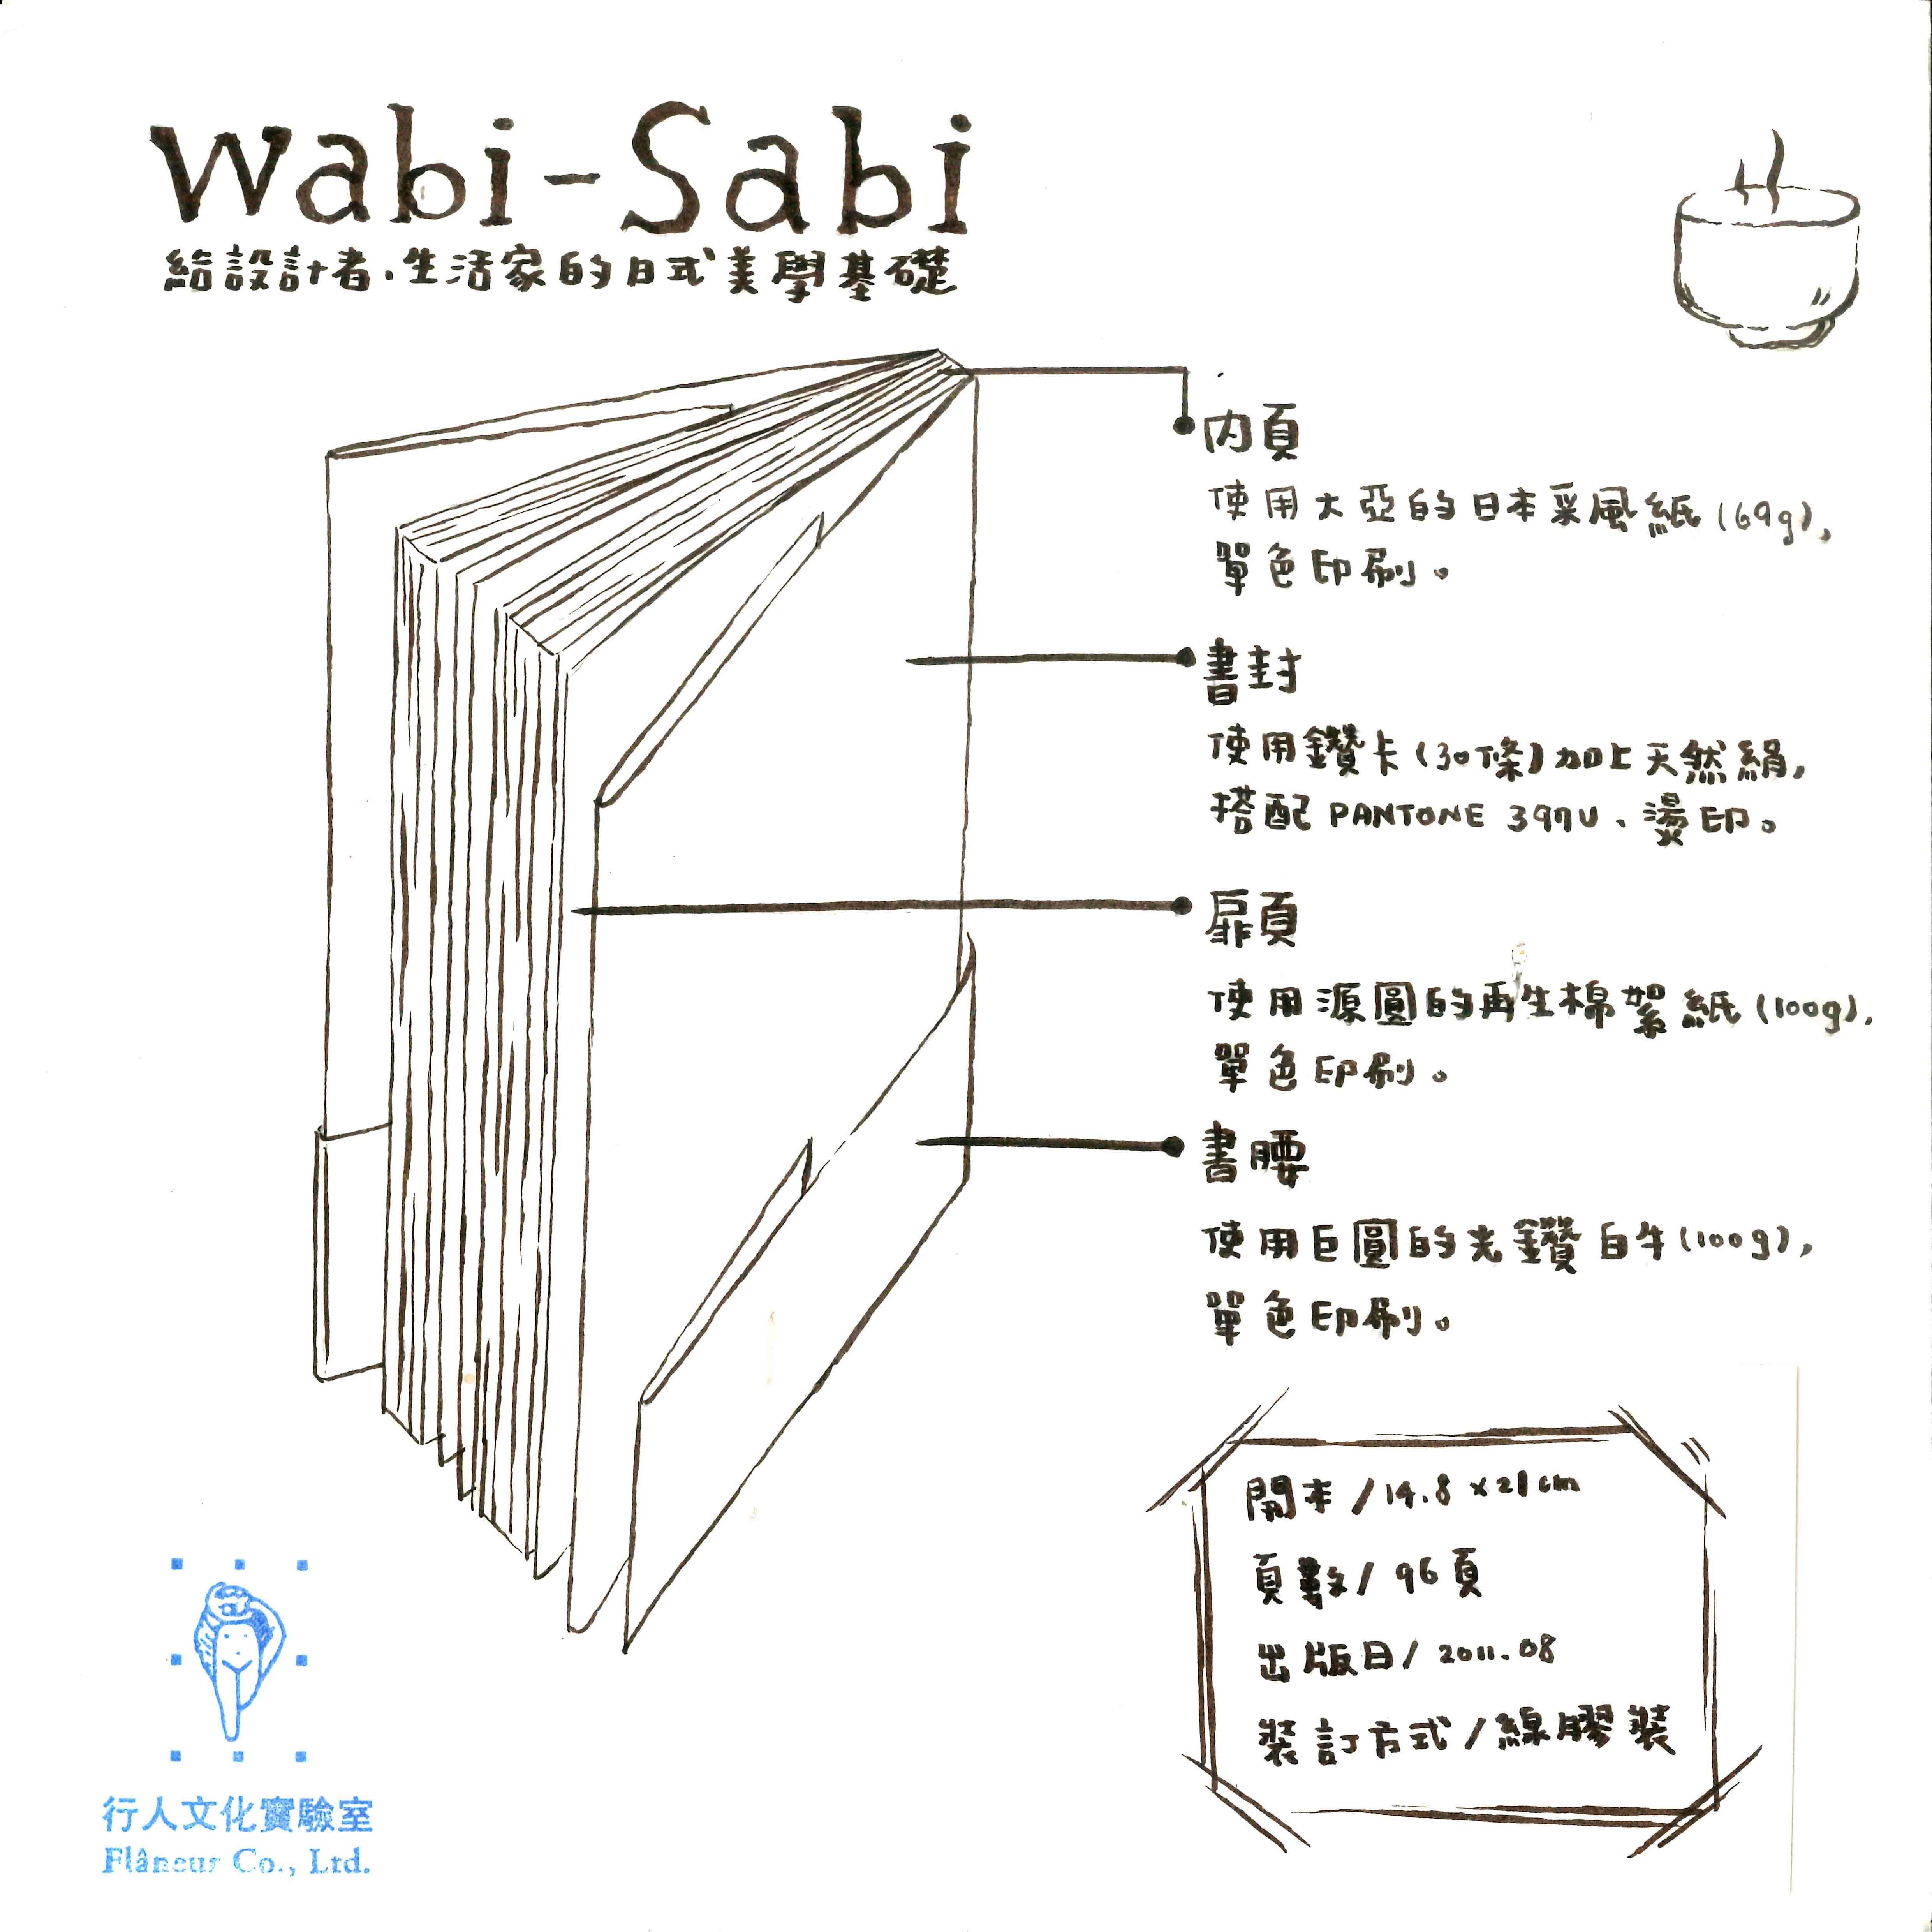 Wabi Sabi 給設計者 生活家的日式美學基礎 Wabi Sabi For